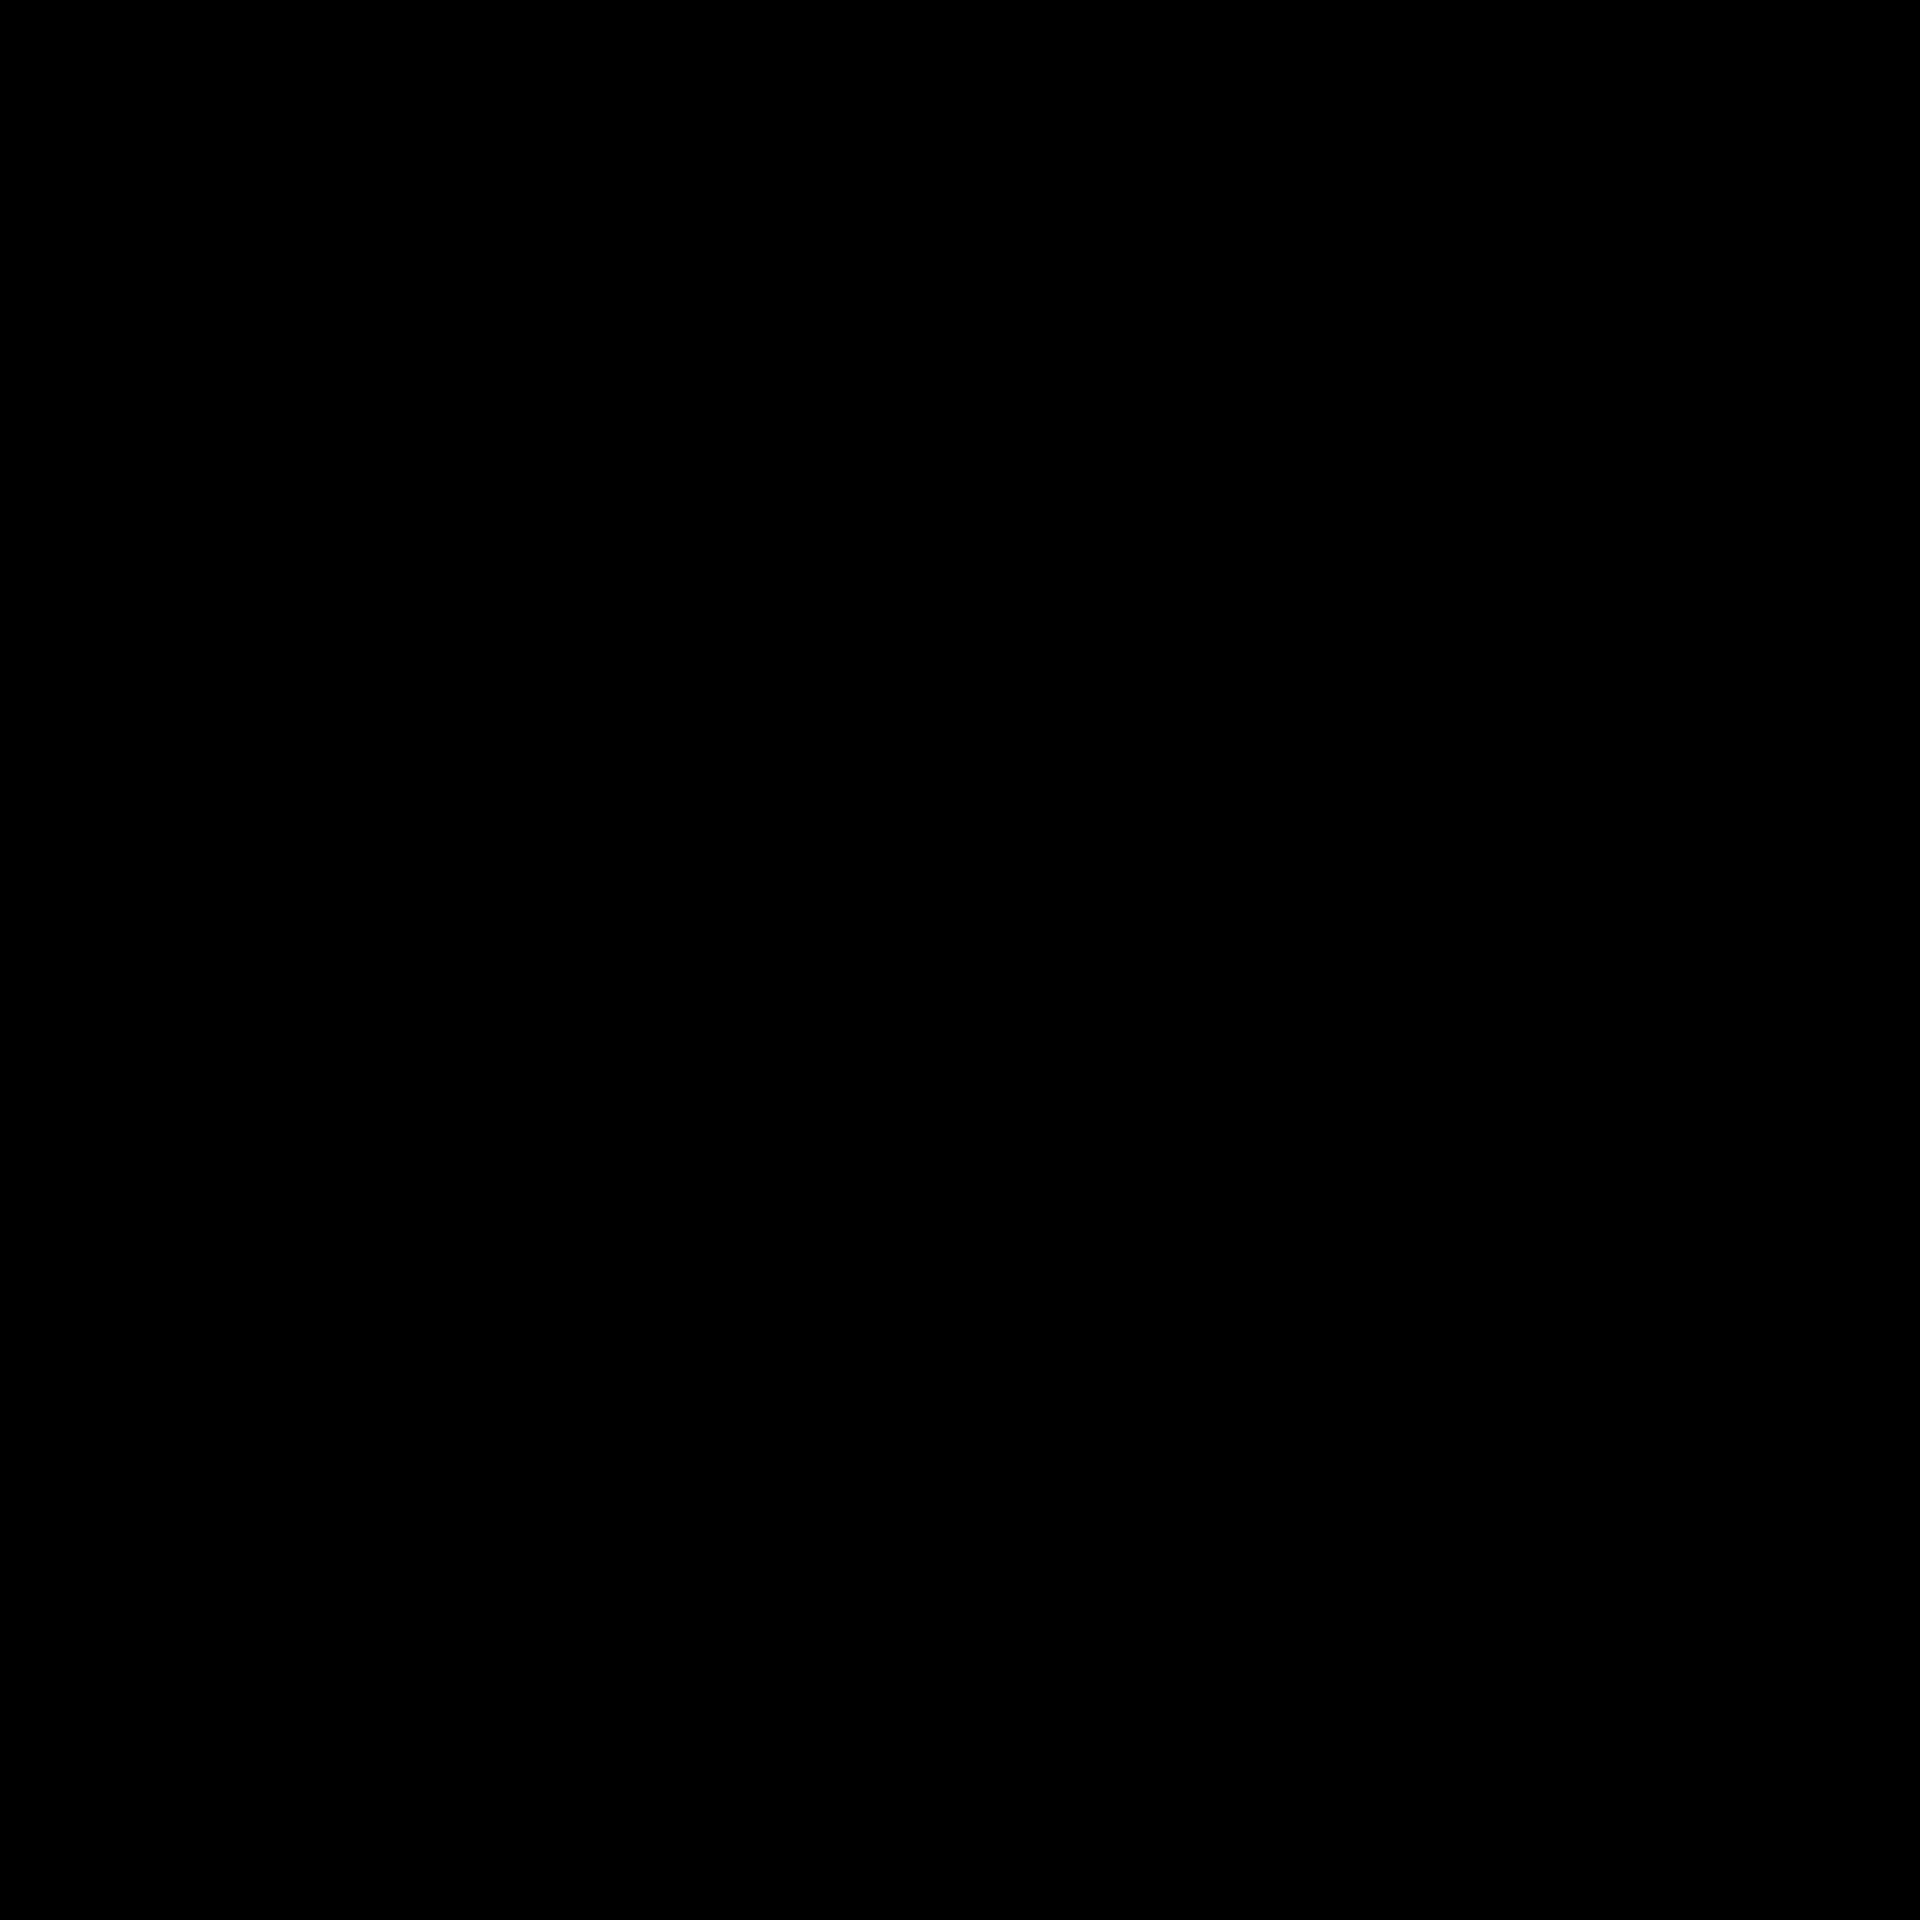 1618486058-bisexual-2933002-1920.png